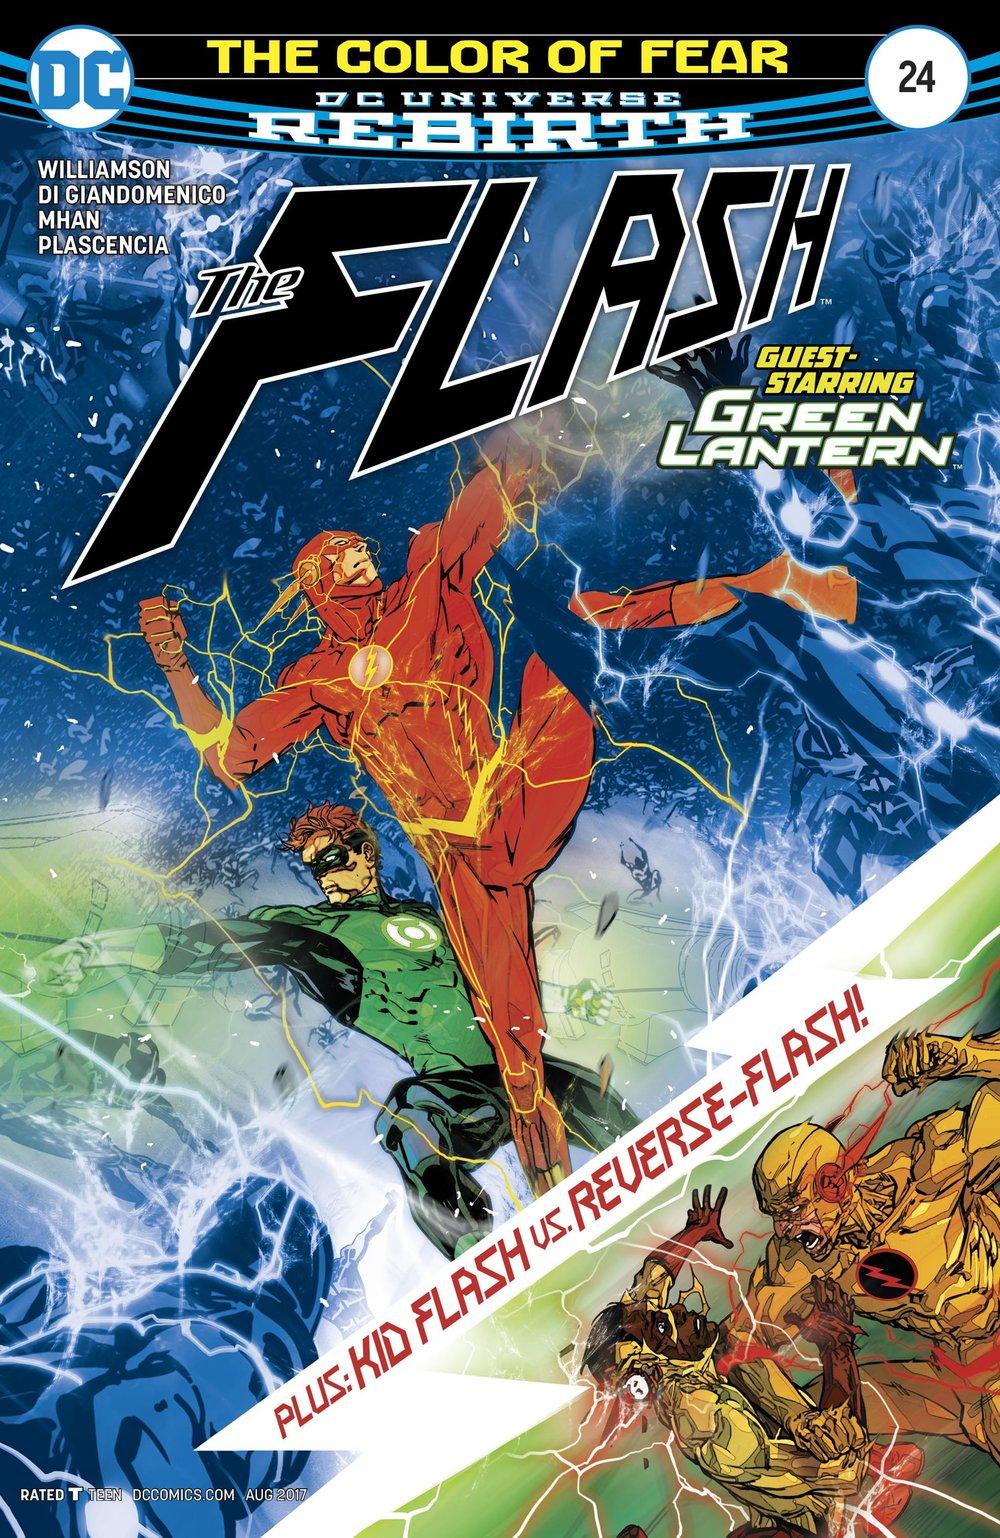 The Flash #24 (DC) - By Joshua Williamson / Artists: Pop Mhan & Carmine Di Giandomenico